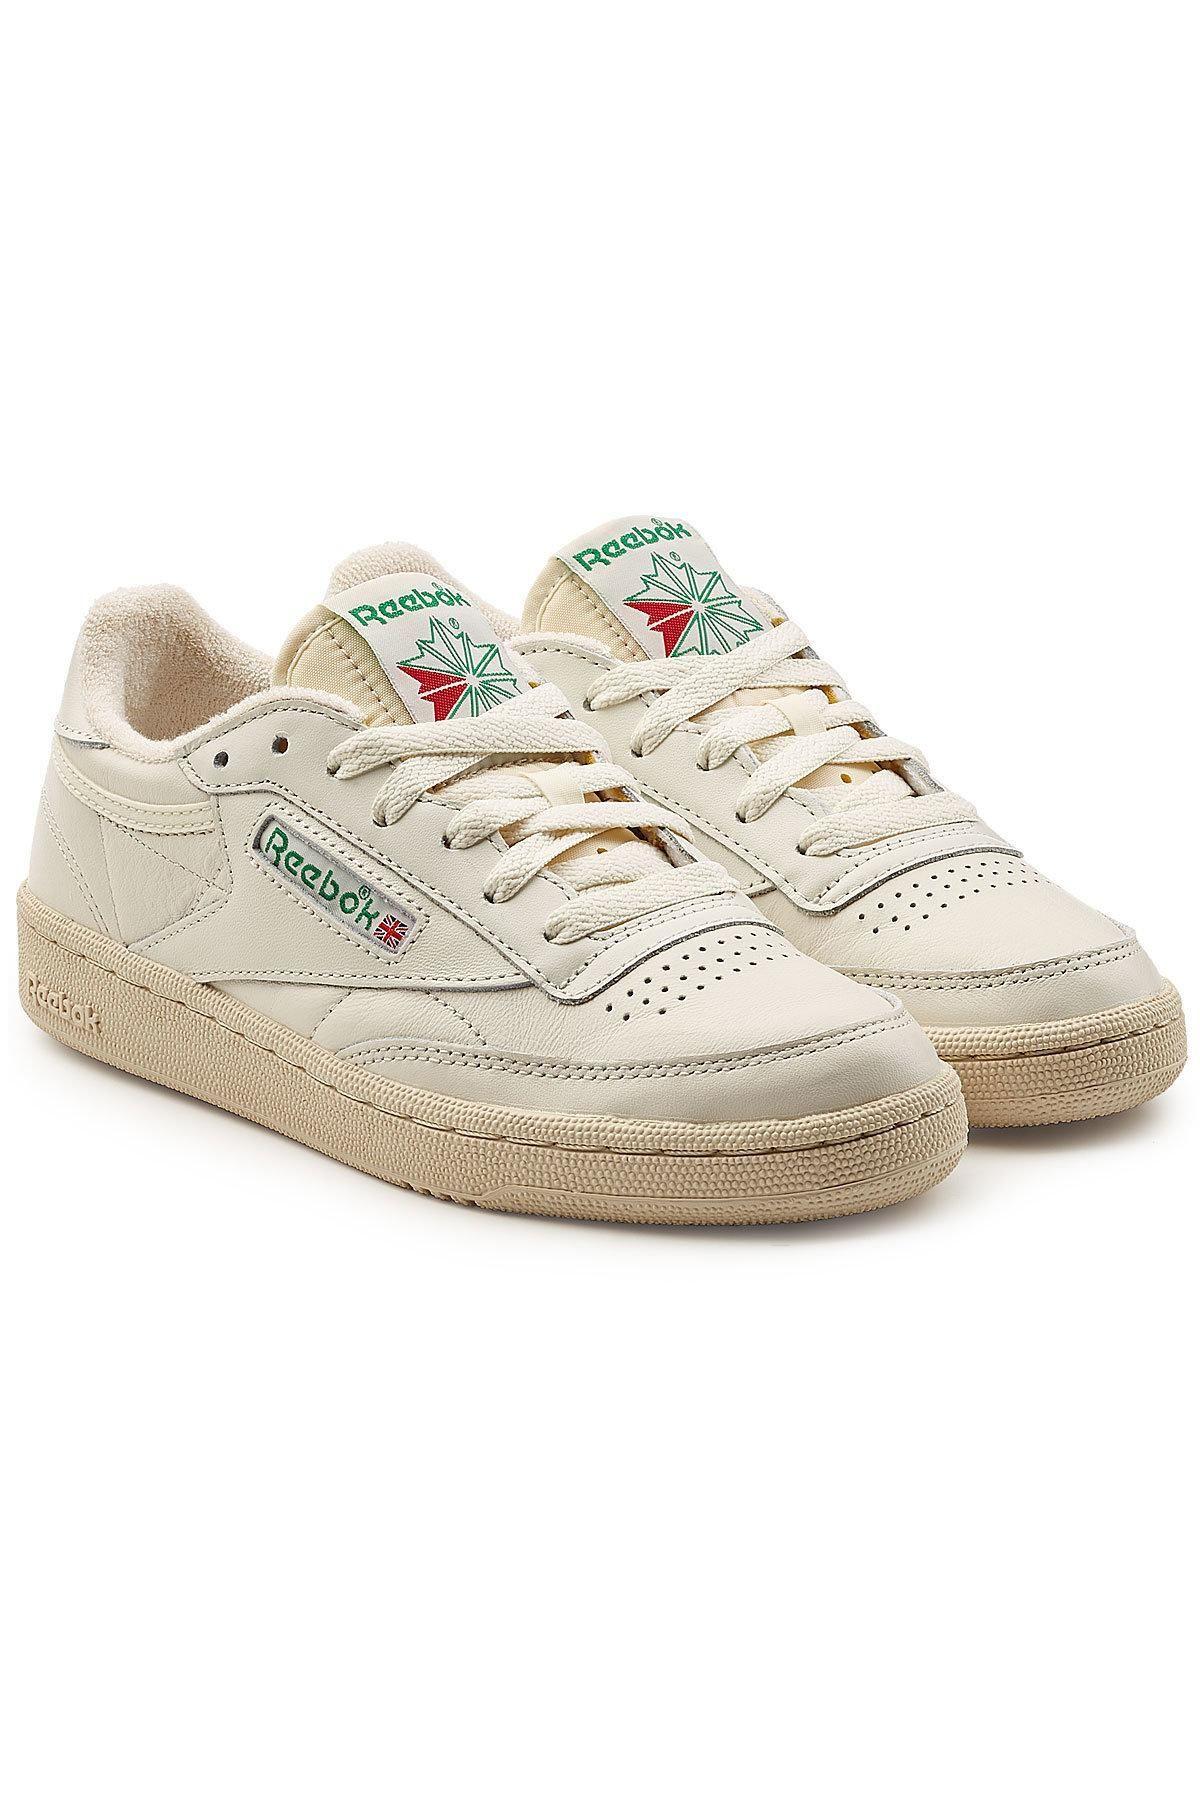 d7c19138d04  STYLEBOP.com (FR NL IT) -  Reebok Reebok Club C 85 Vintage Leather  Sneakers - AdoreWe.com